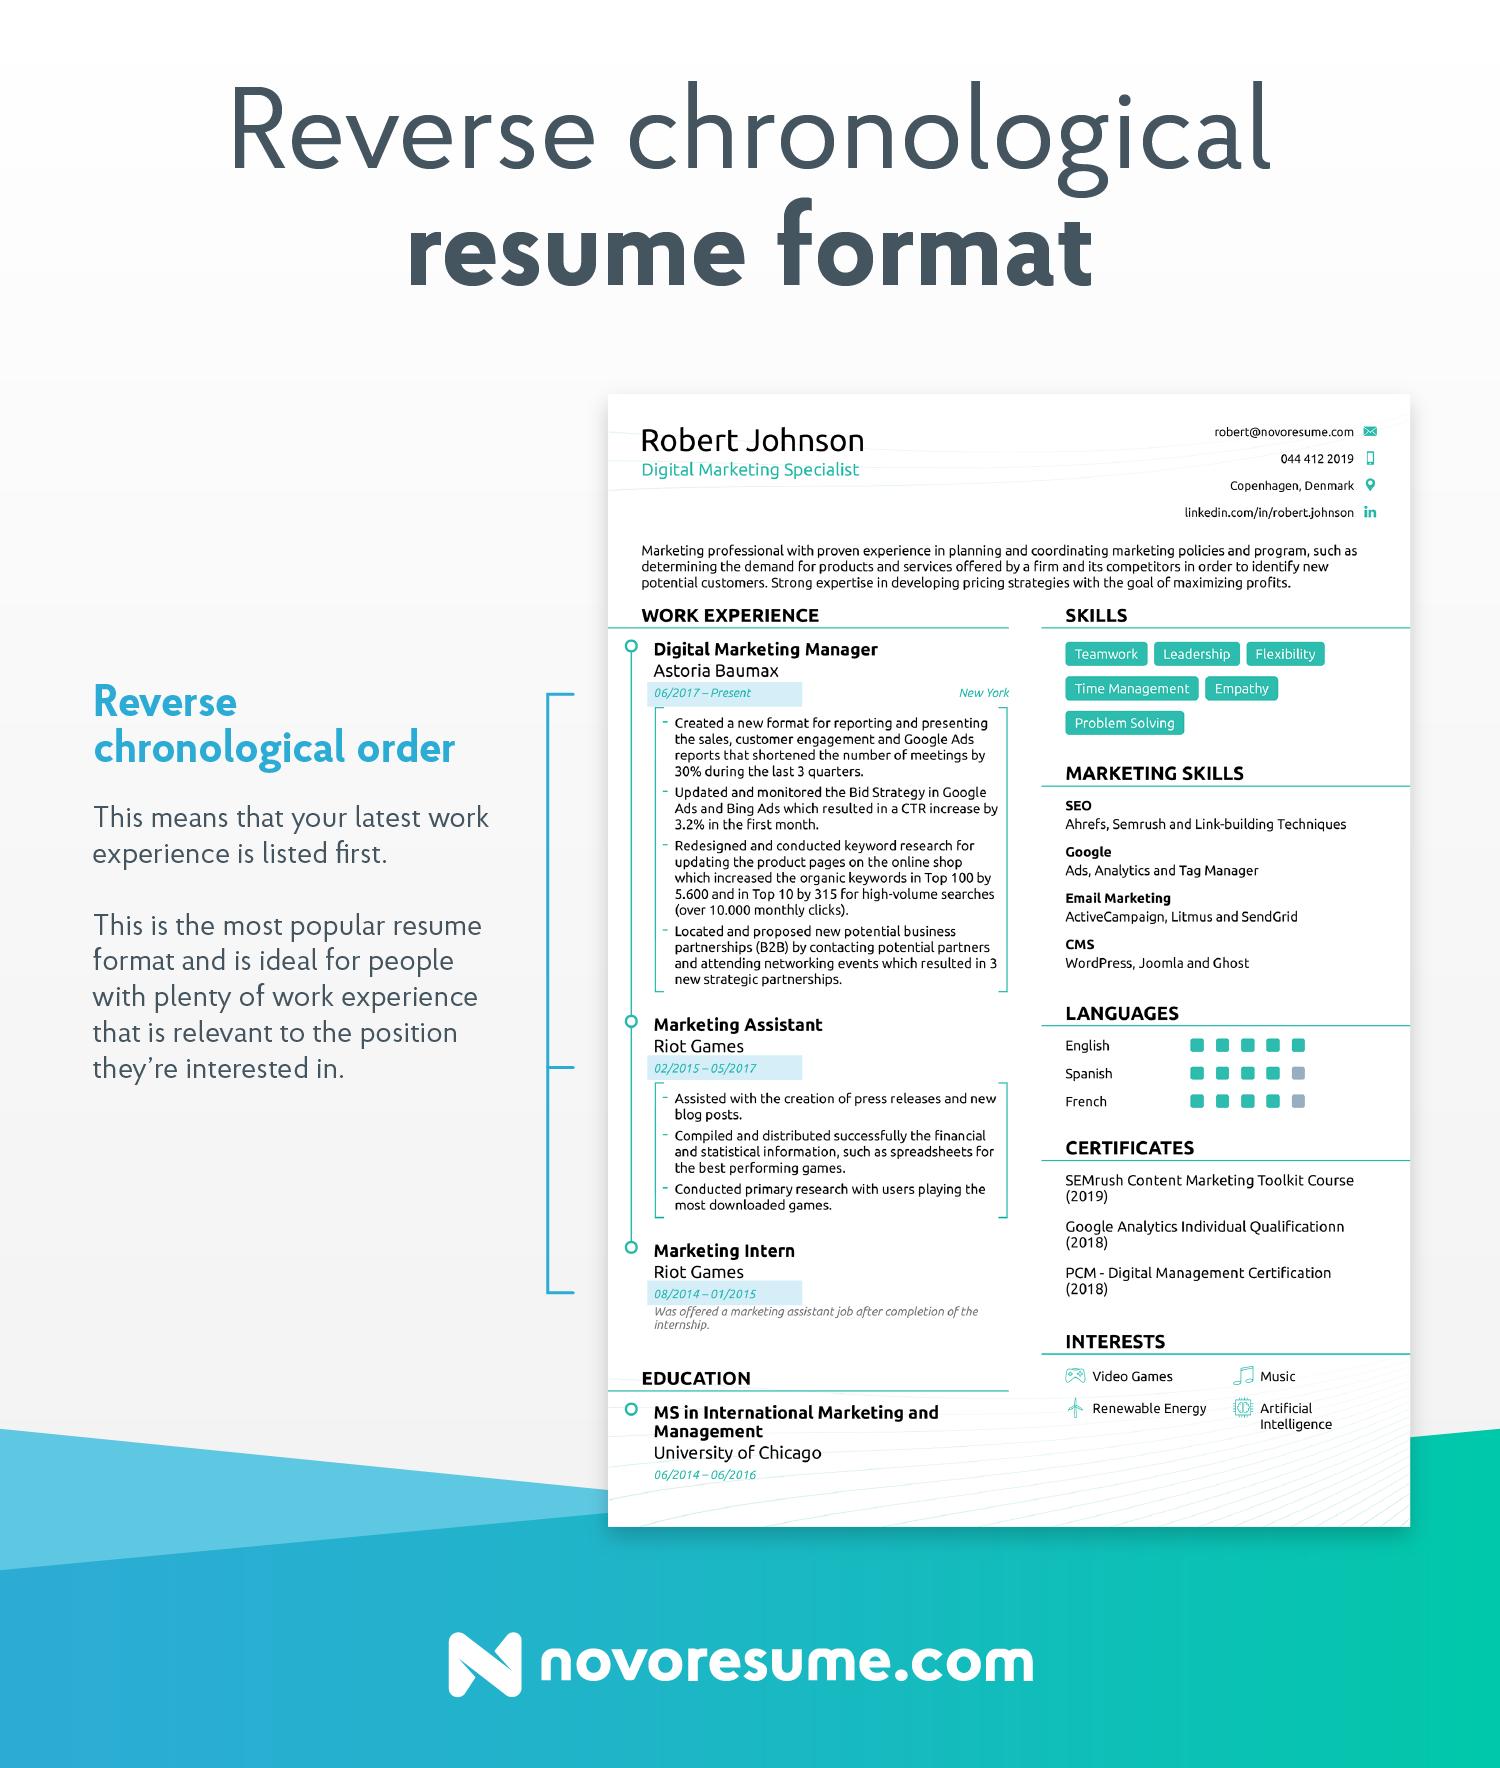 resume ideas reverse chronological resume